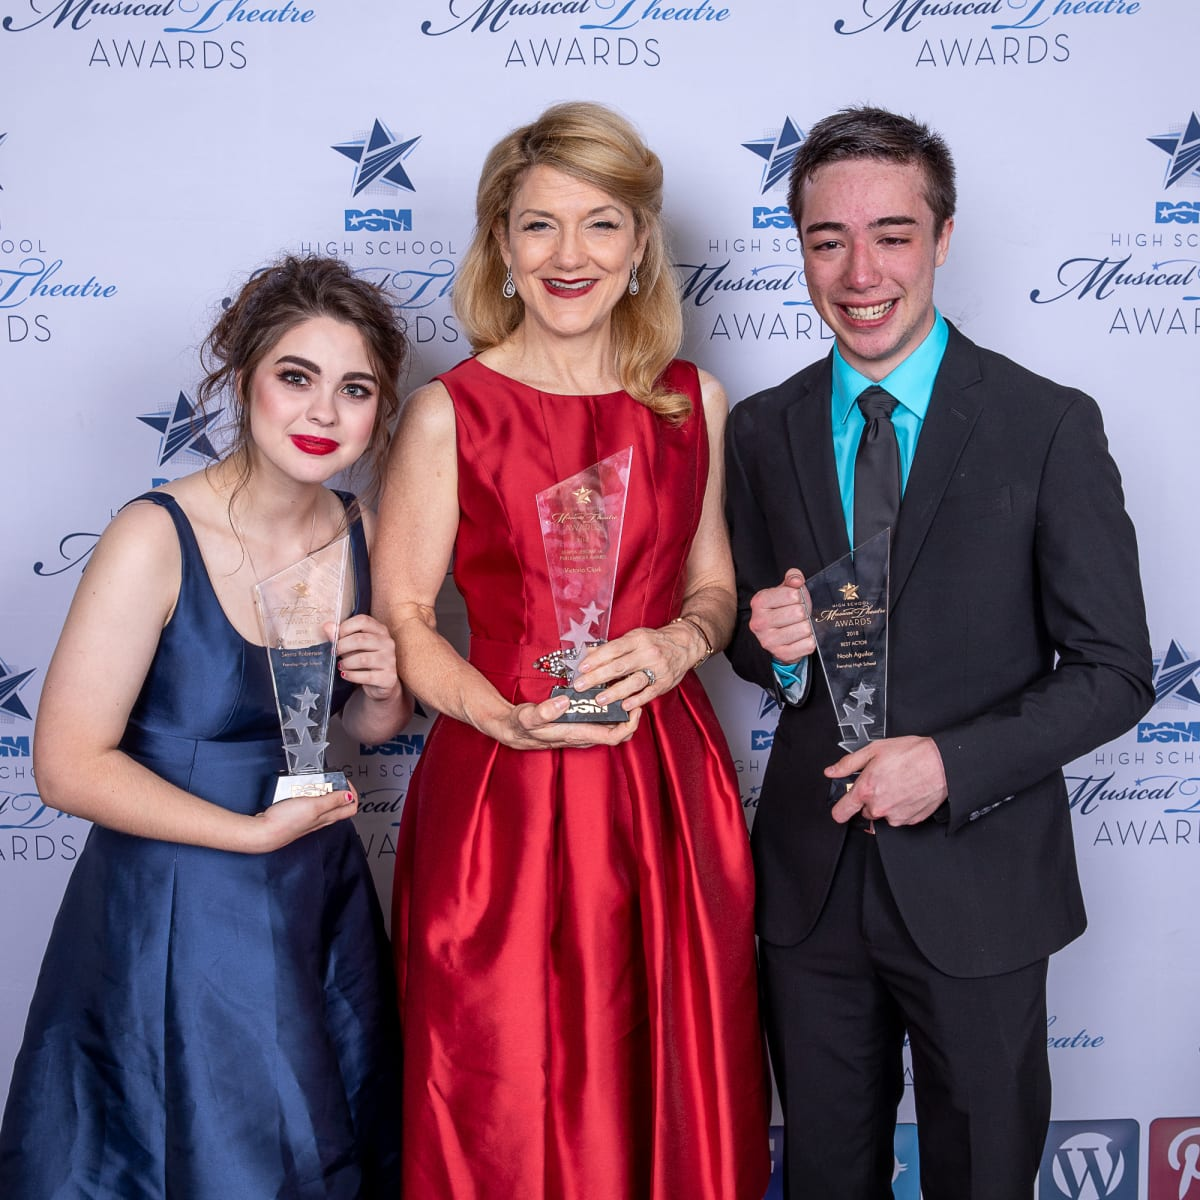 Sierra Roberson, Victoria Clark, and Noah Aguilar